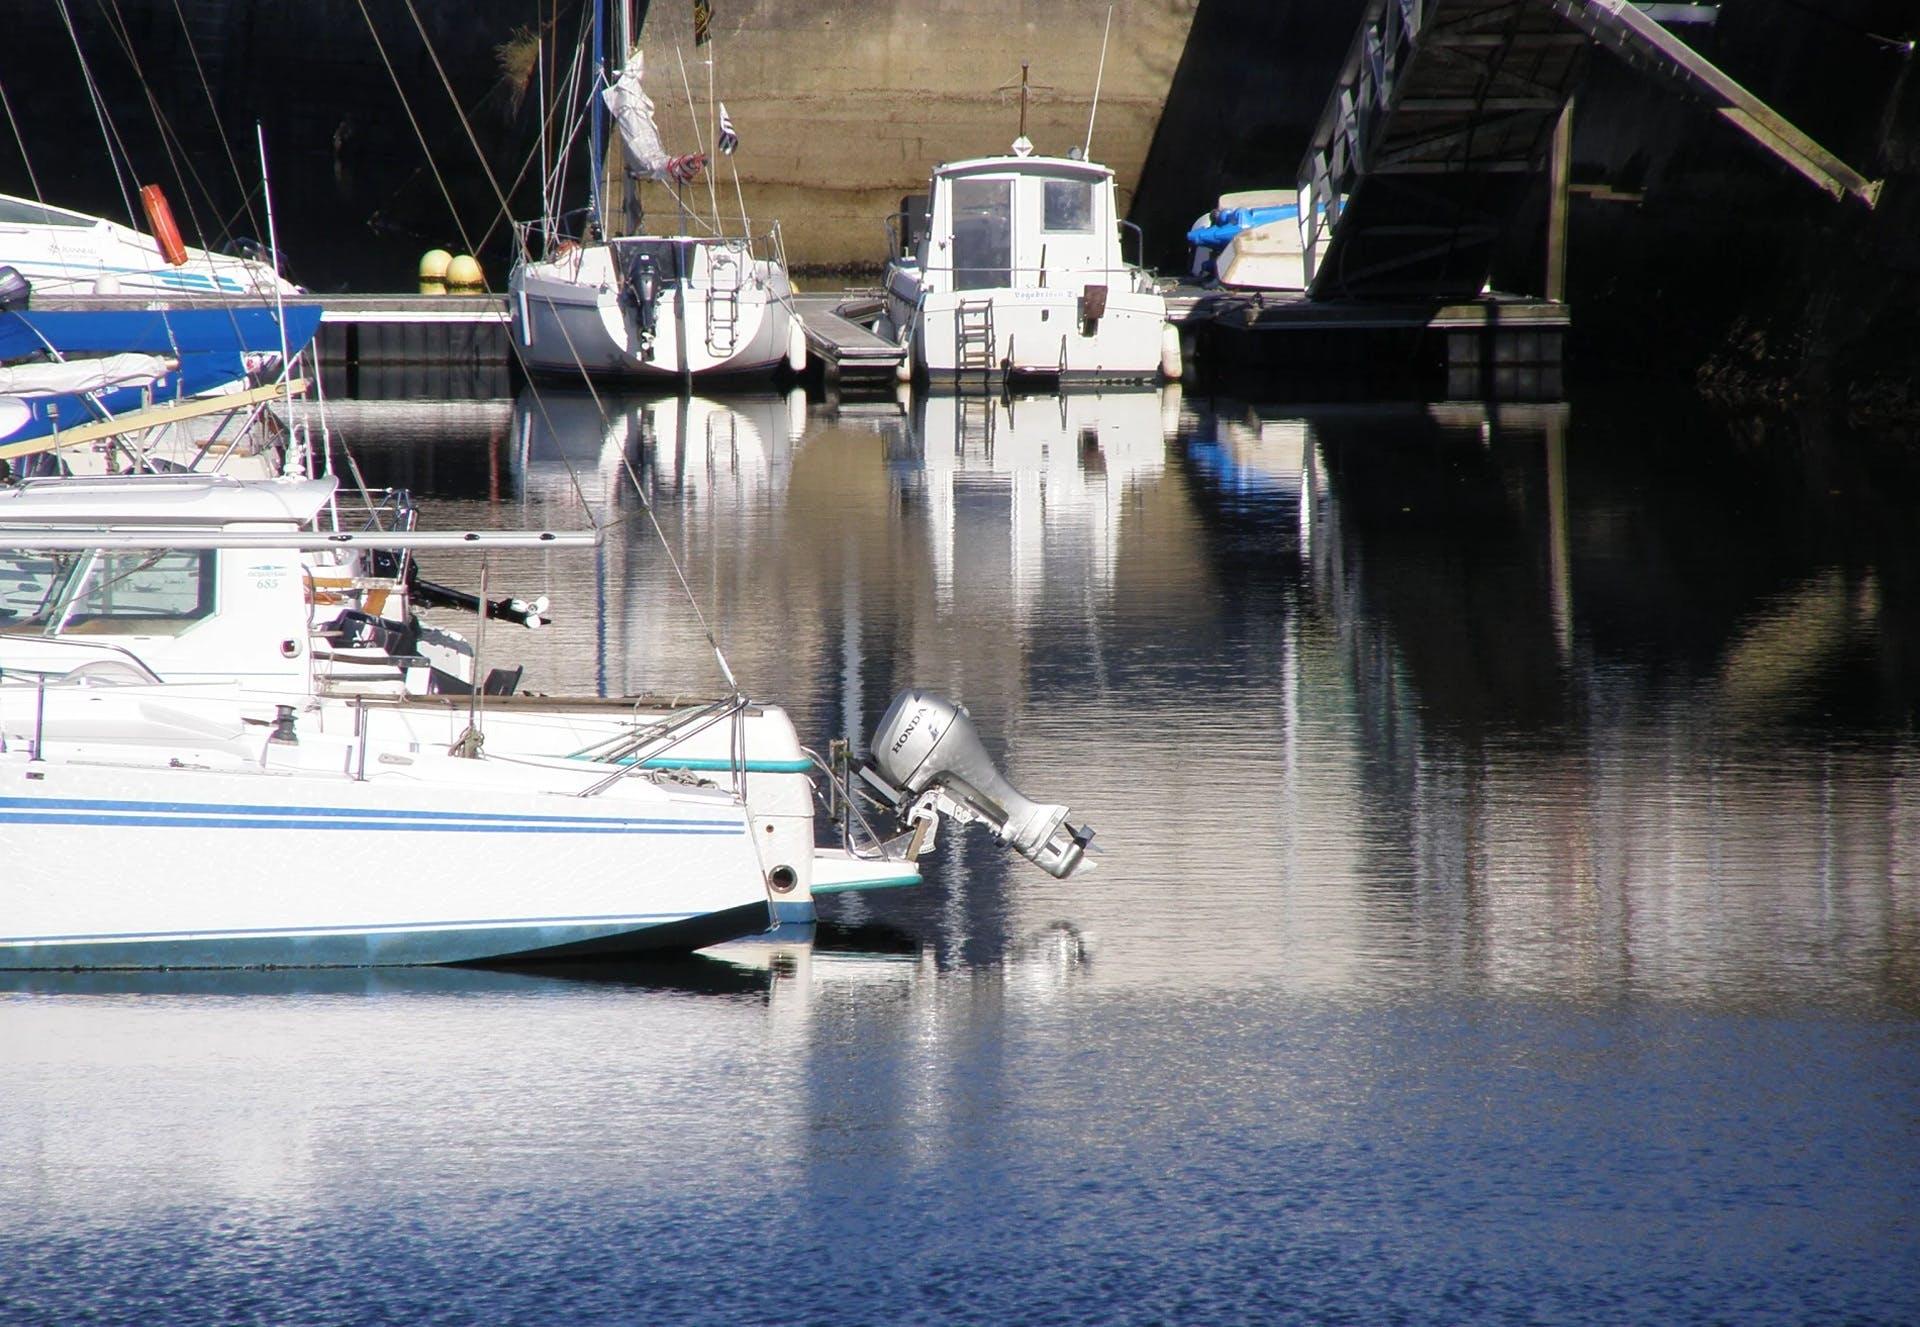 Free stock photo of sea, holiday, france, boats